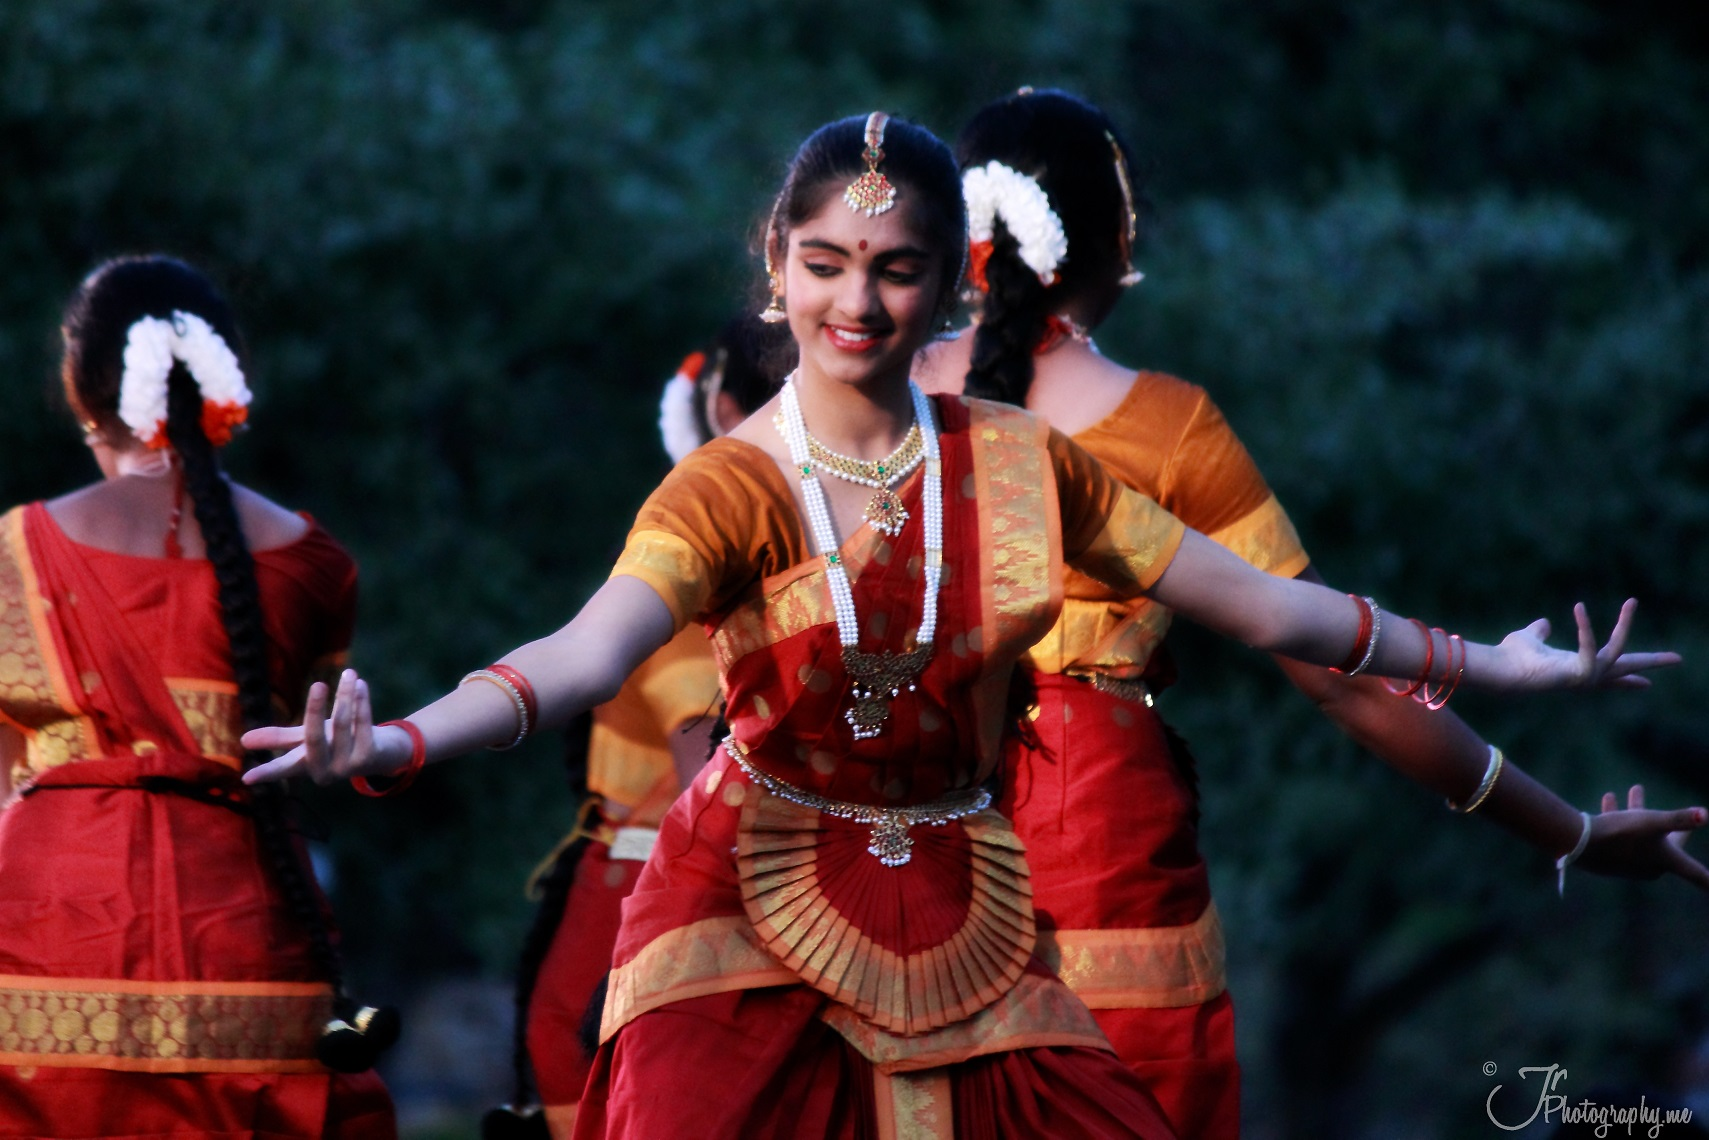 Dipavali Hindu festival and dance